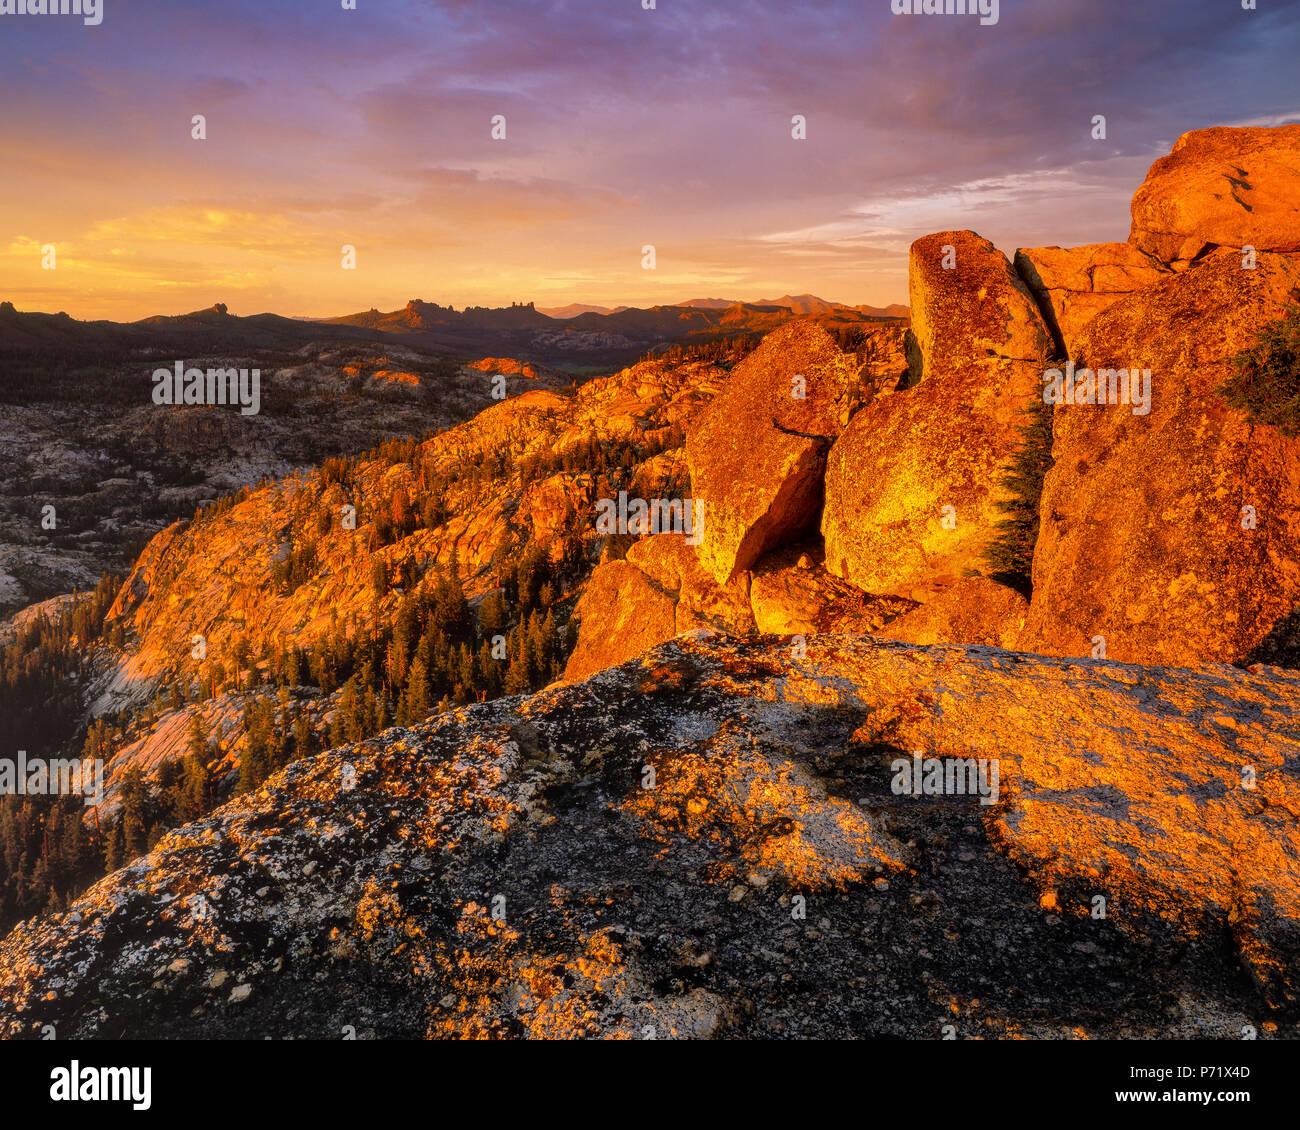 Coucher du soleil, explosions Rock Formation, Emigrant Wilderness, forêt nationale Stanislaus, Sierra Nevada, en Californie Photo Stock